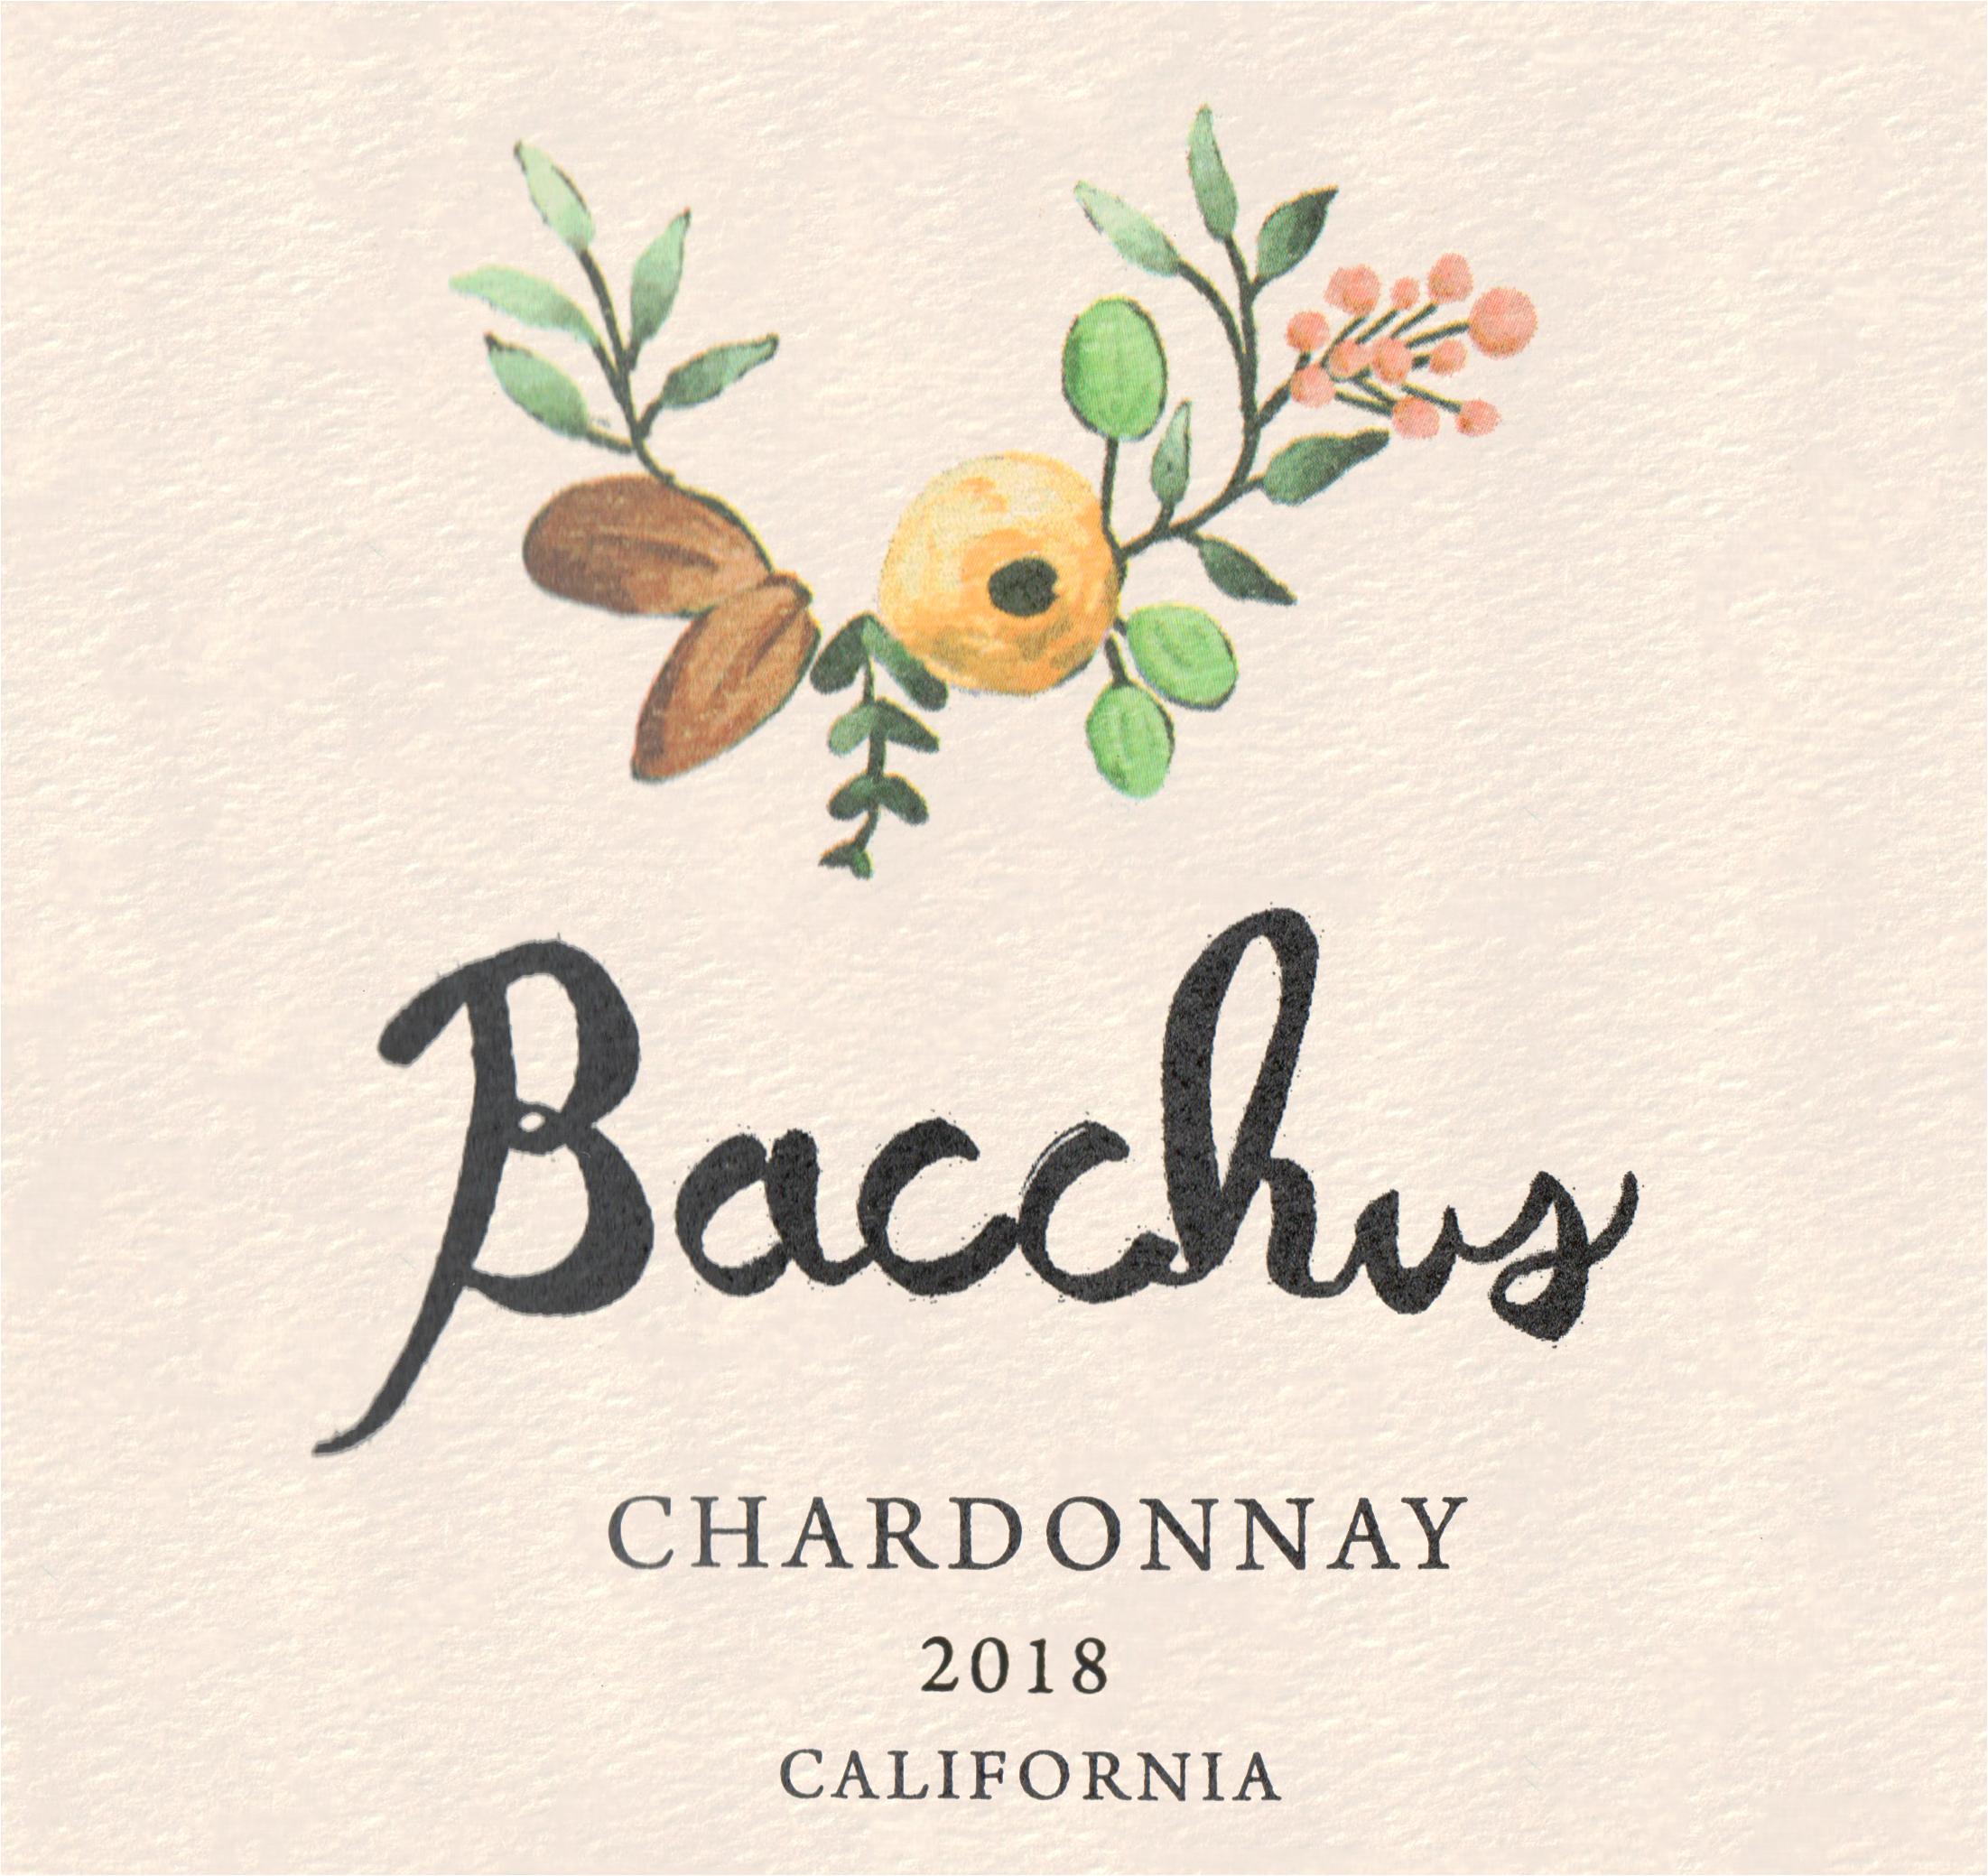 Bacchus Chardonnay 2018